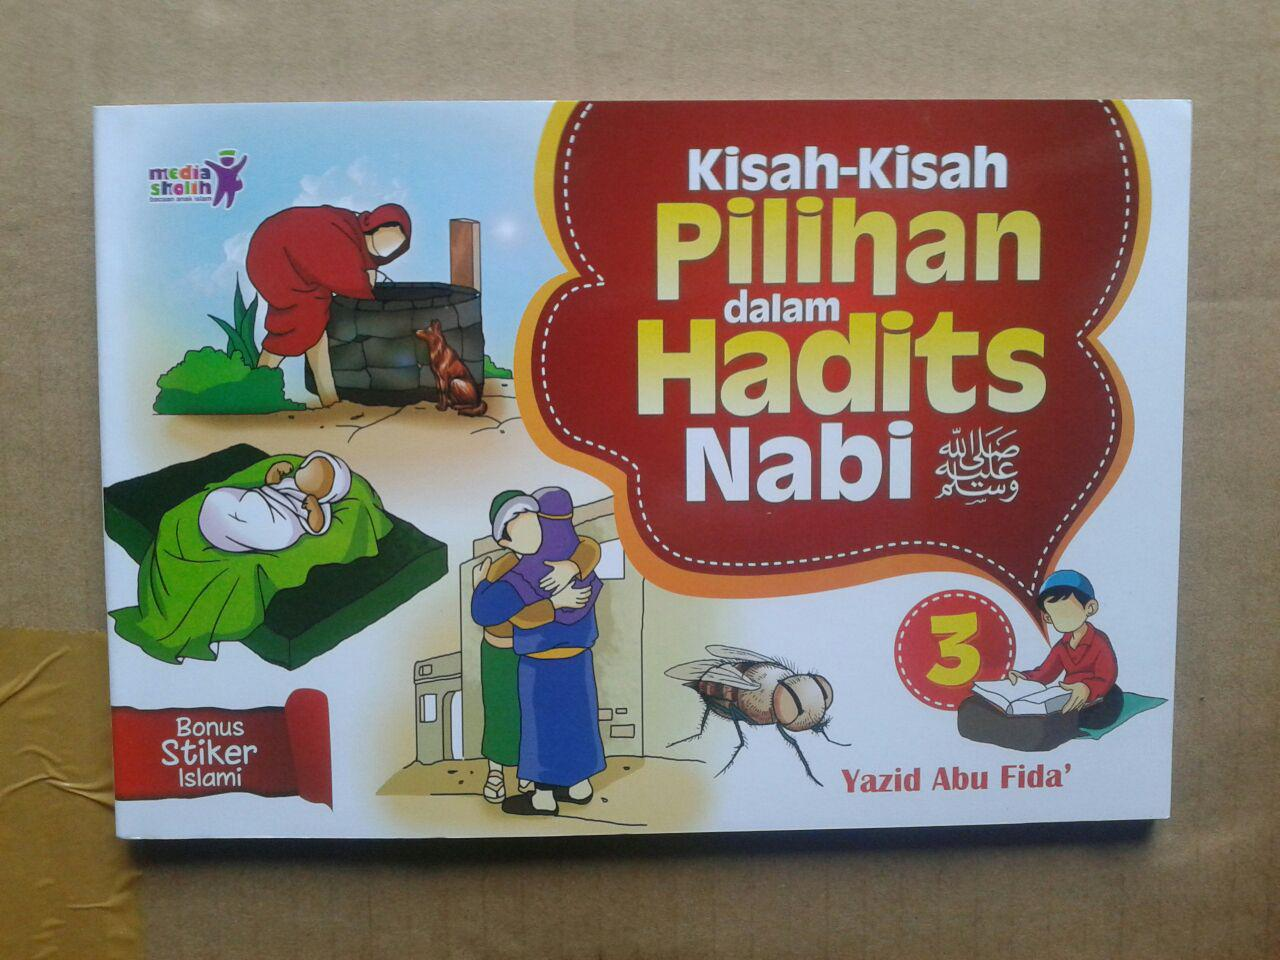 Buku Anak Kisah-Kisah Pilihan Dalam Hadits Nabi Jilid 3 cover